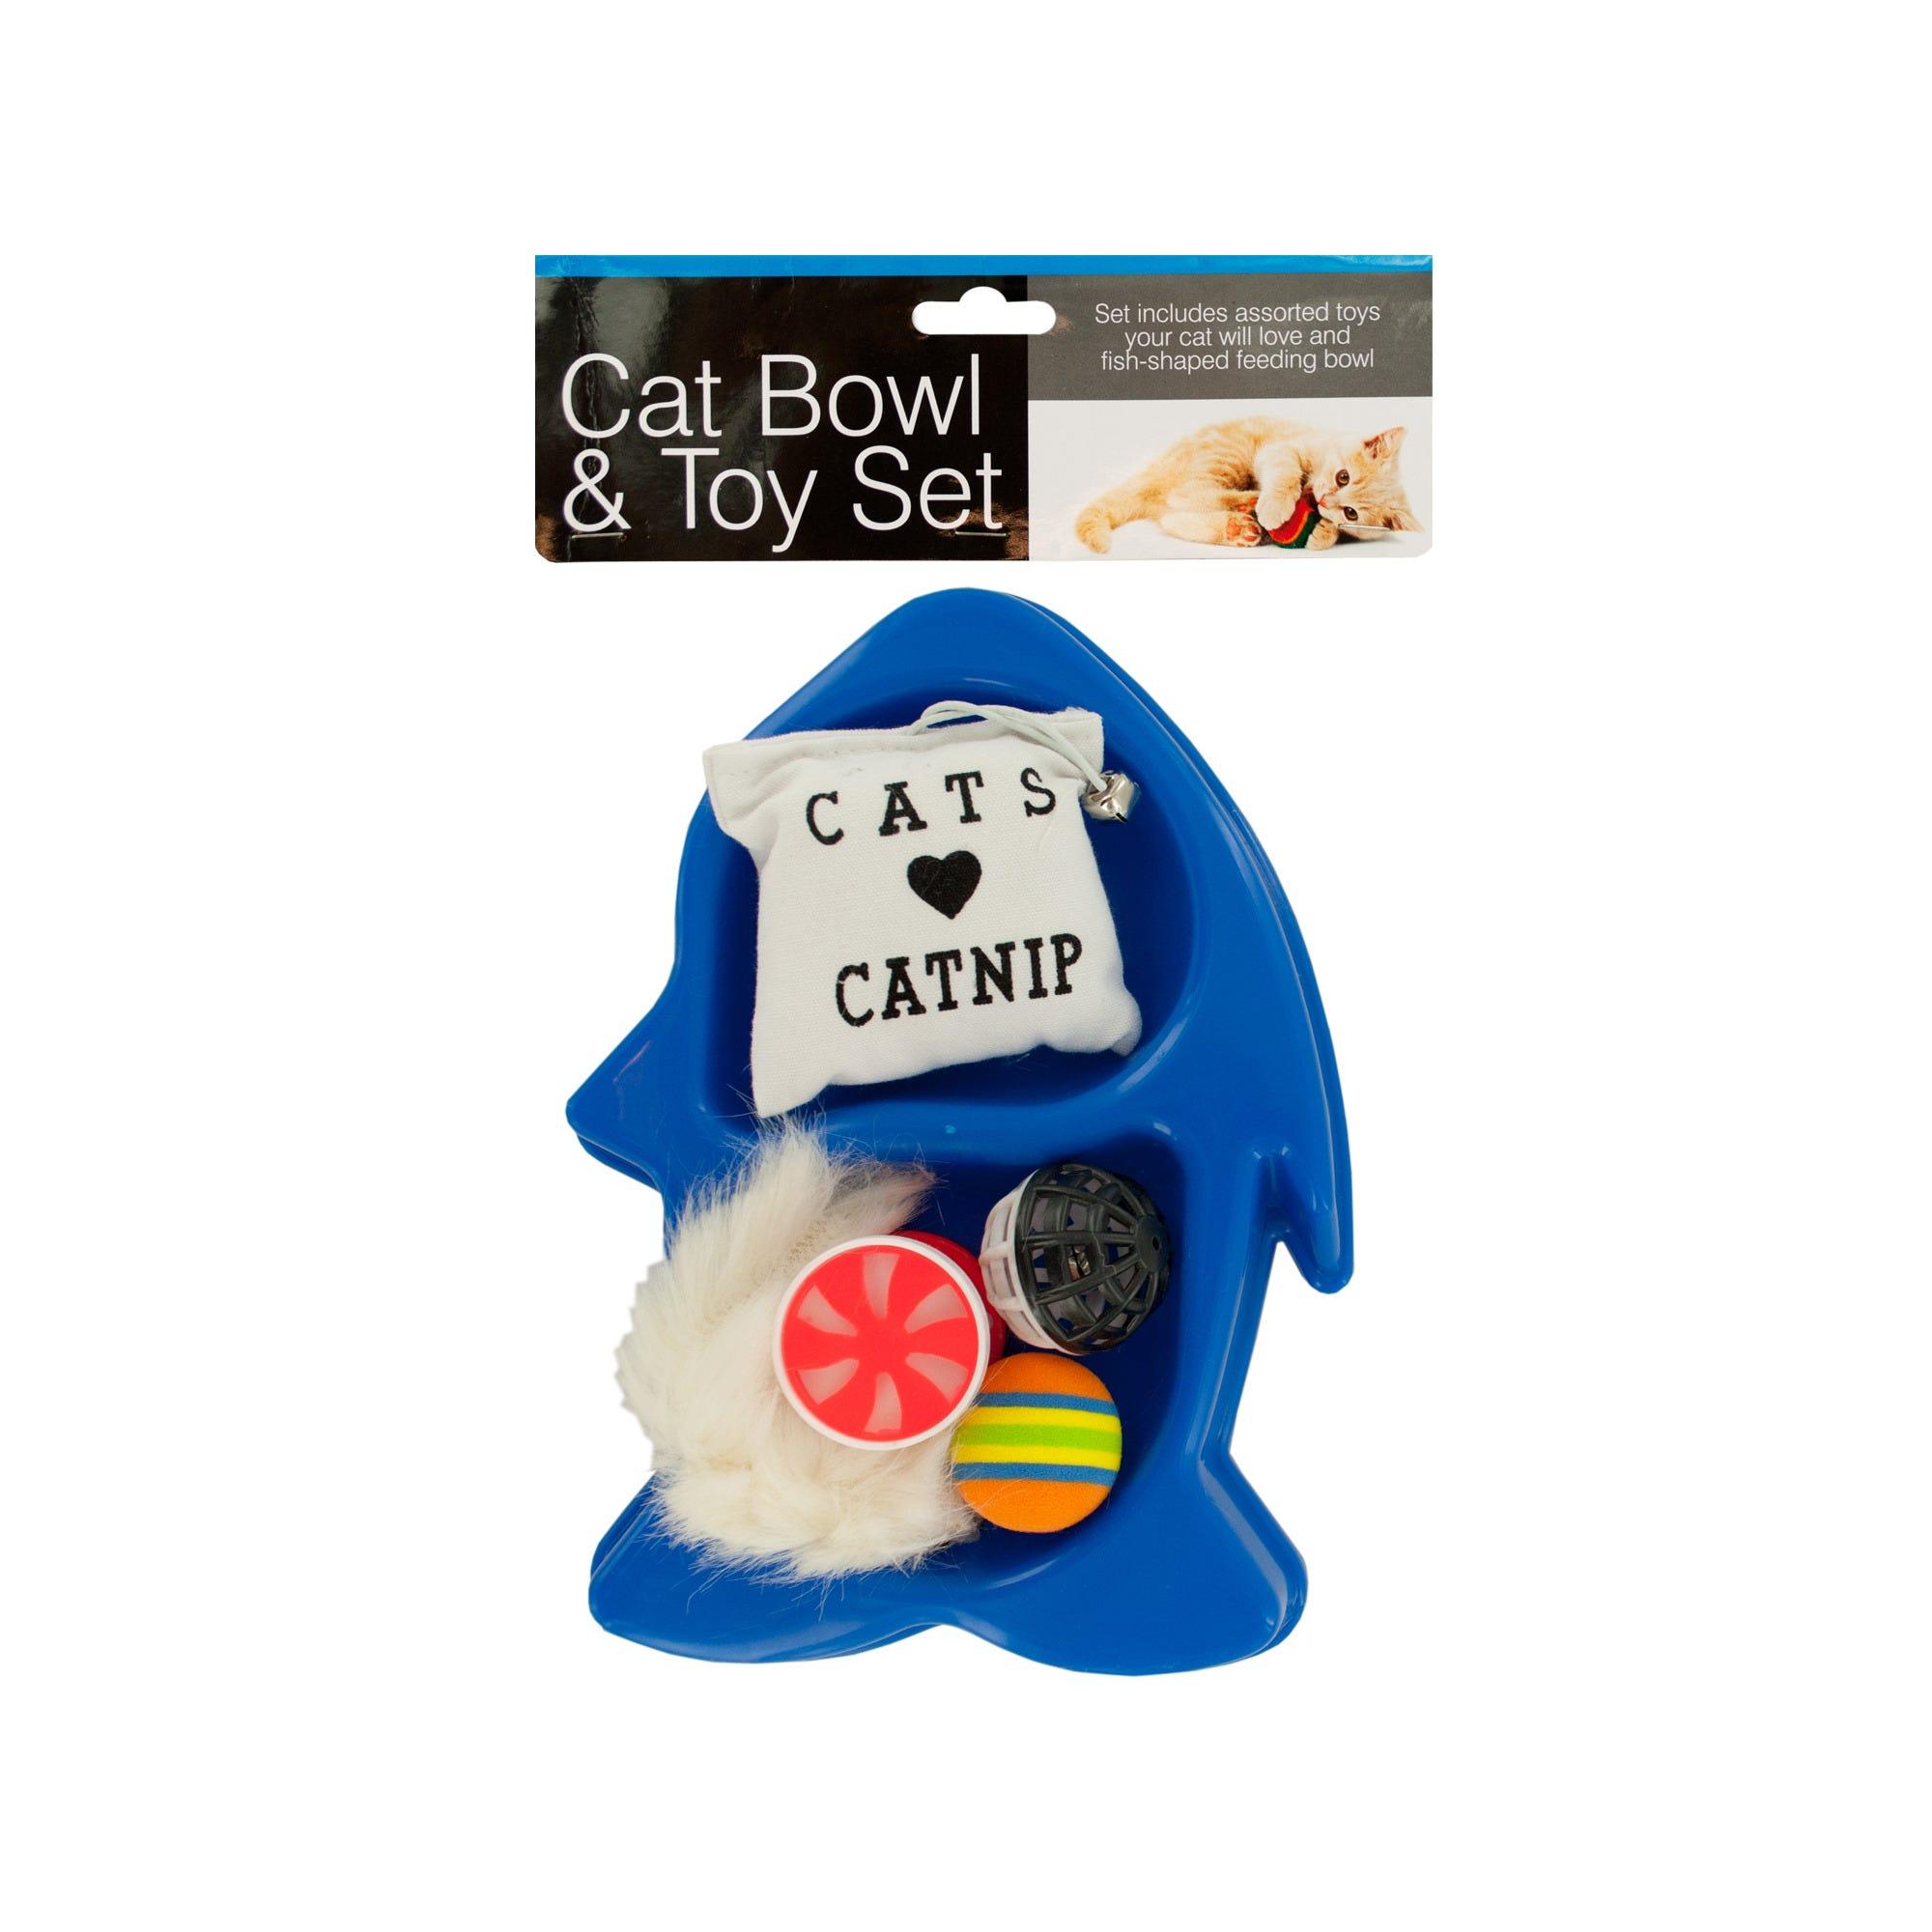 fish-shaped-cat-bowl-toy-set